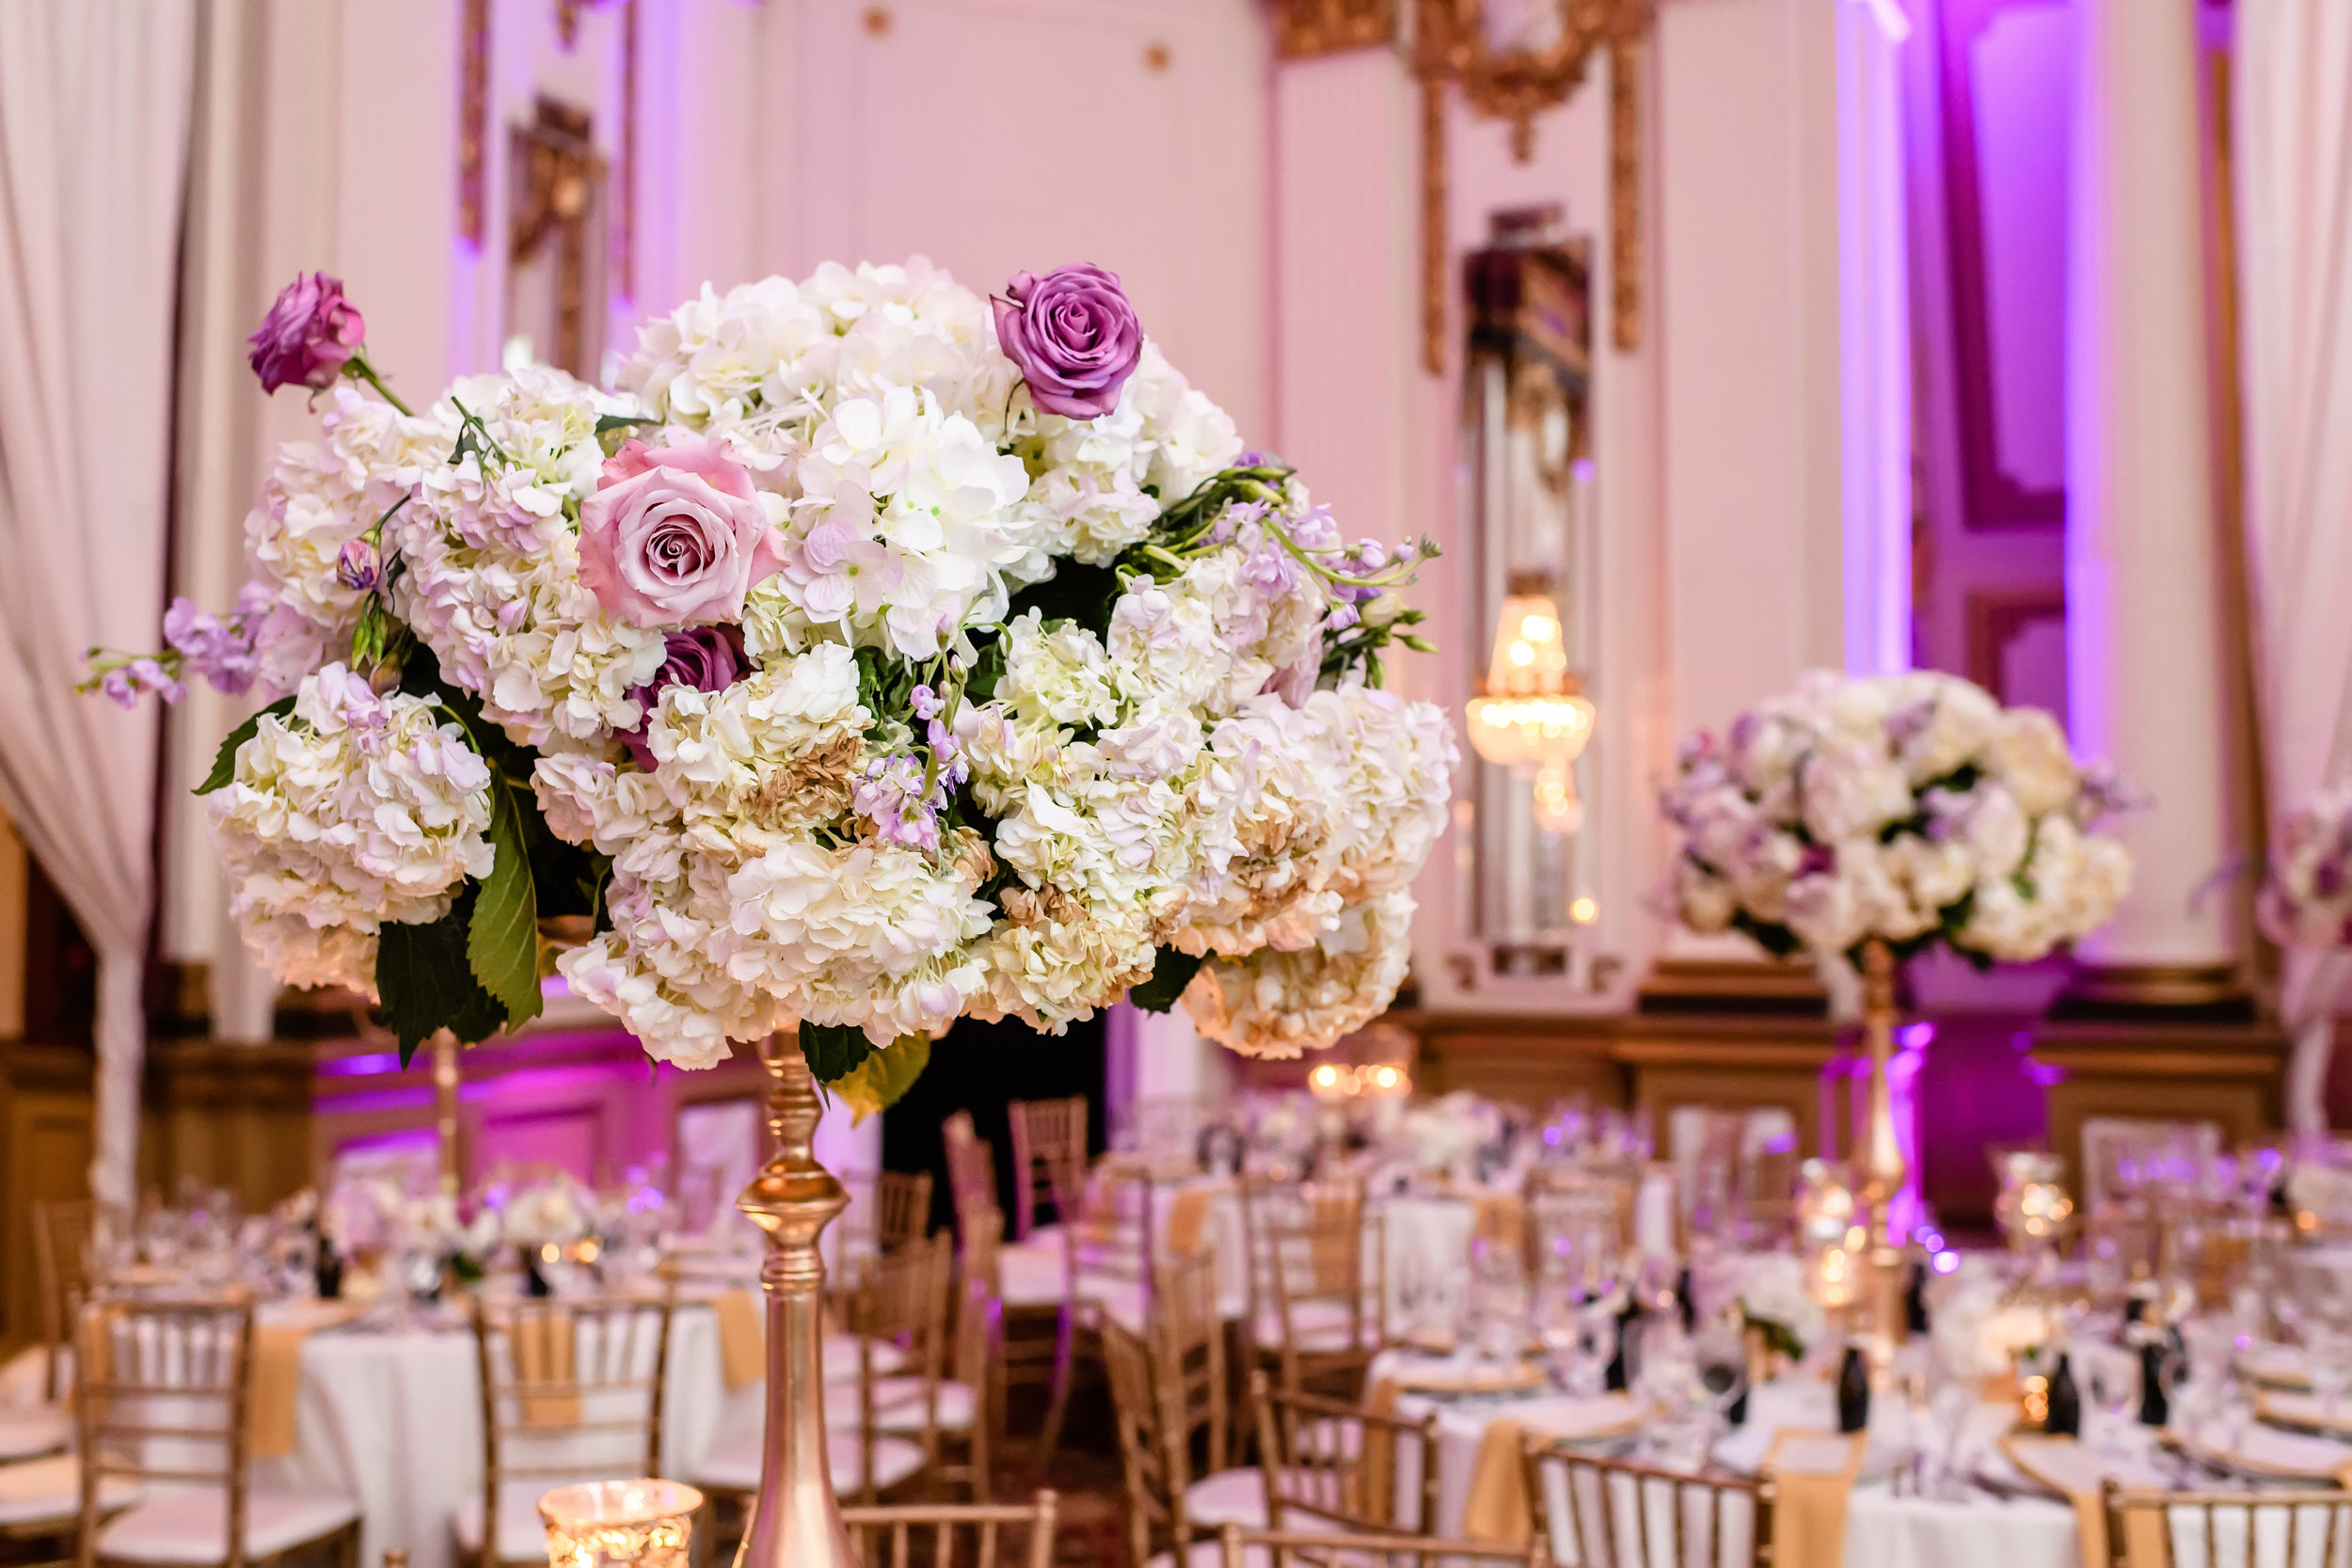 Imani_Kevin_NYE_Wedding_Belvedere_Hotel_Baltimore_MD_Reception-0011.jpg